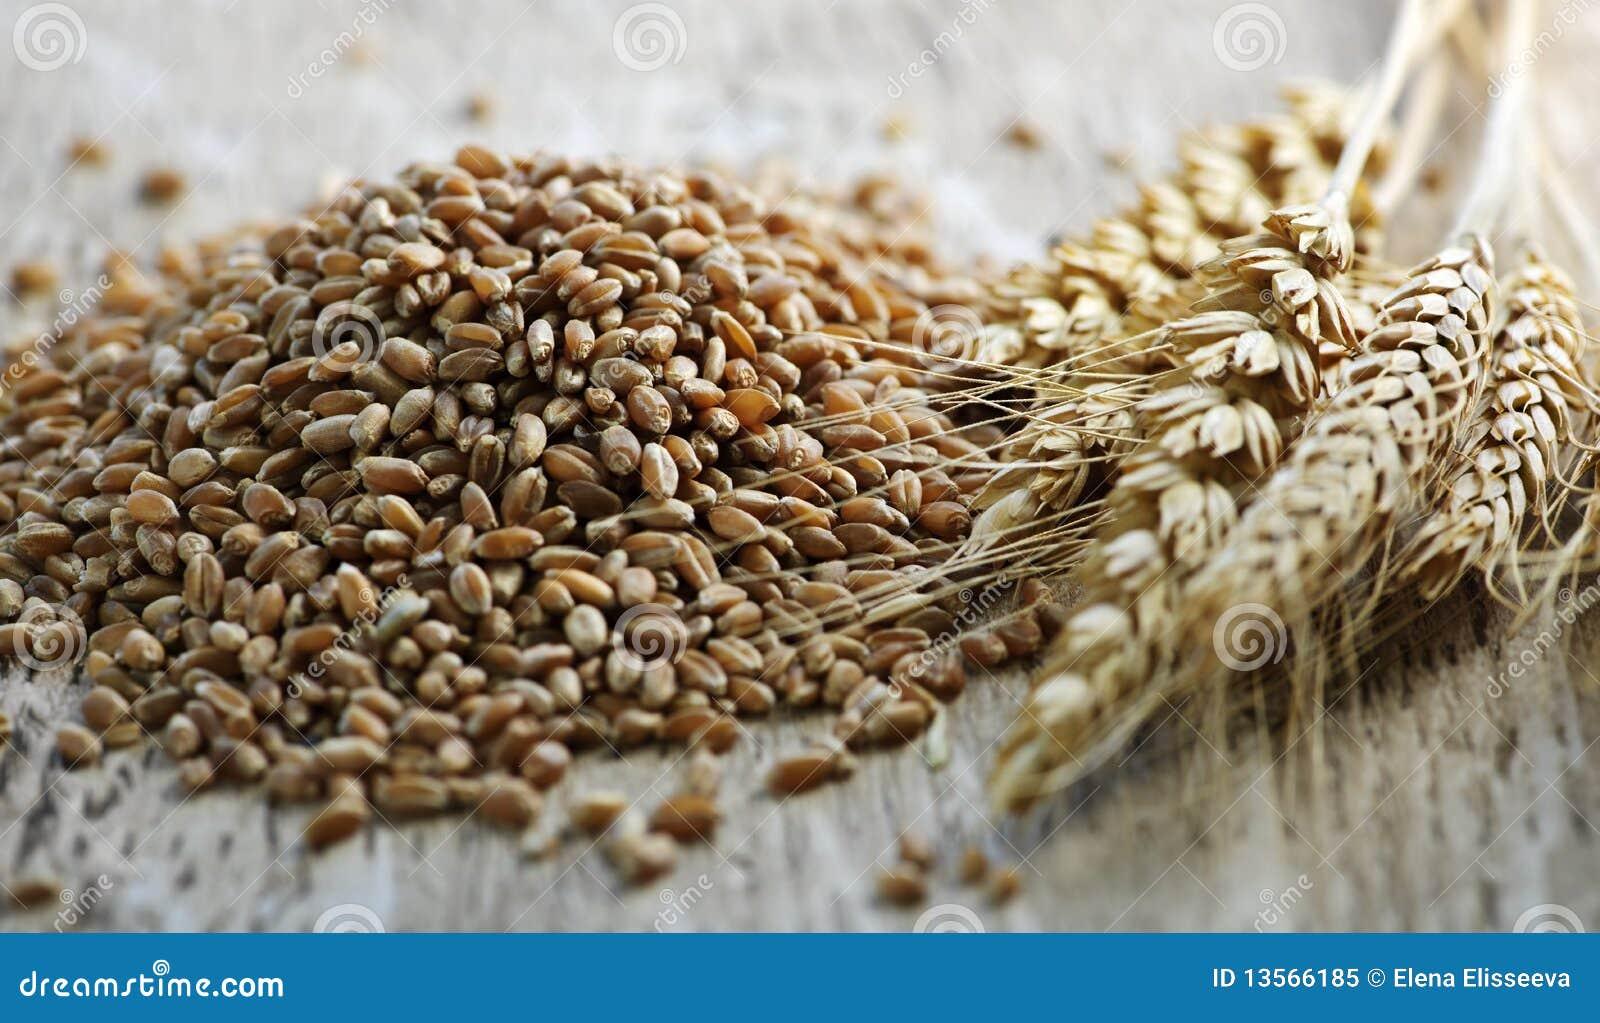 Wheat Free Vegan Foods